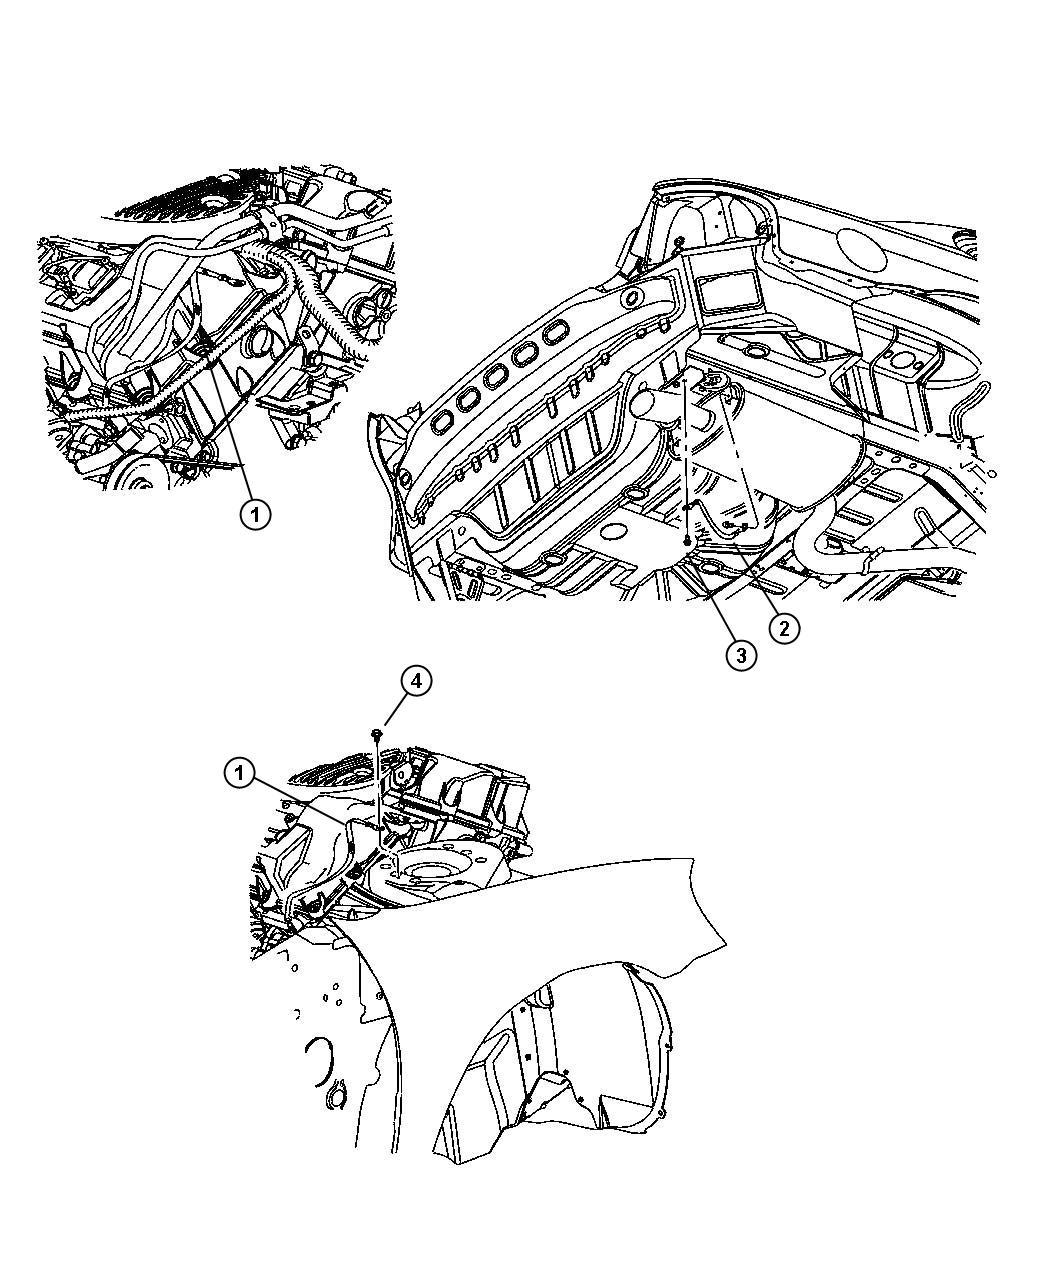 Dodge Stratus Screw. Hex flange head. M6.3x1.81x16.00